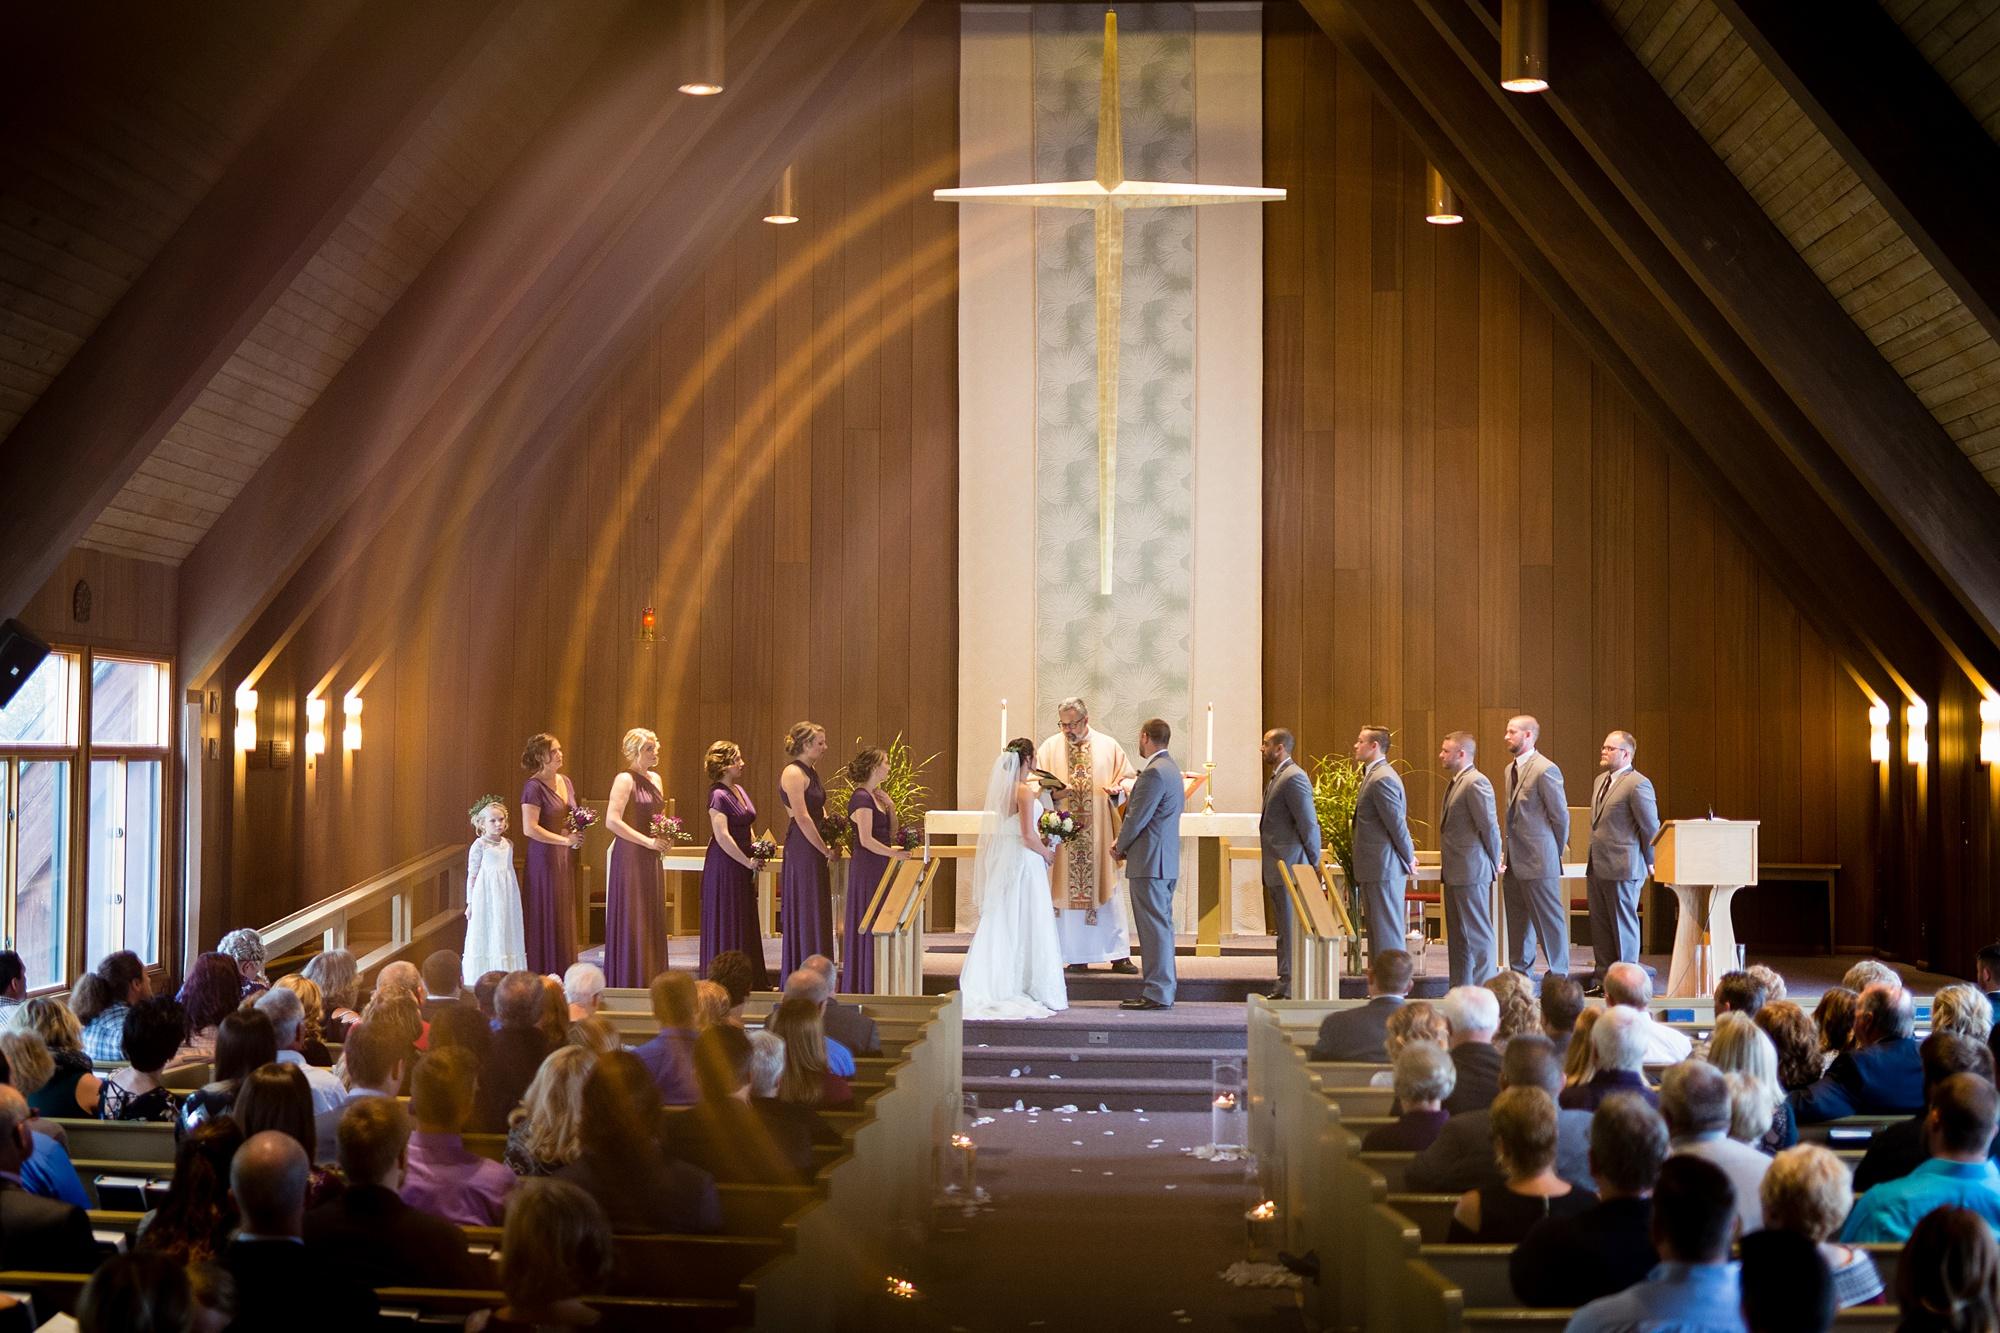 Brandon_Shafer_Photography_Emily_Travis_Kalamazoo_Wedding_Photography_0025.jpg